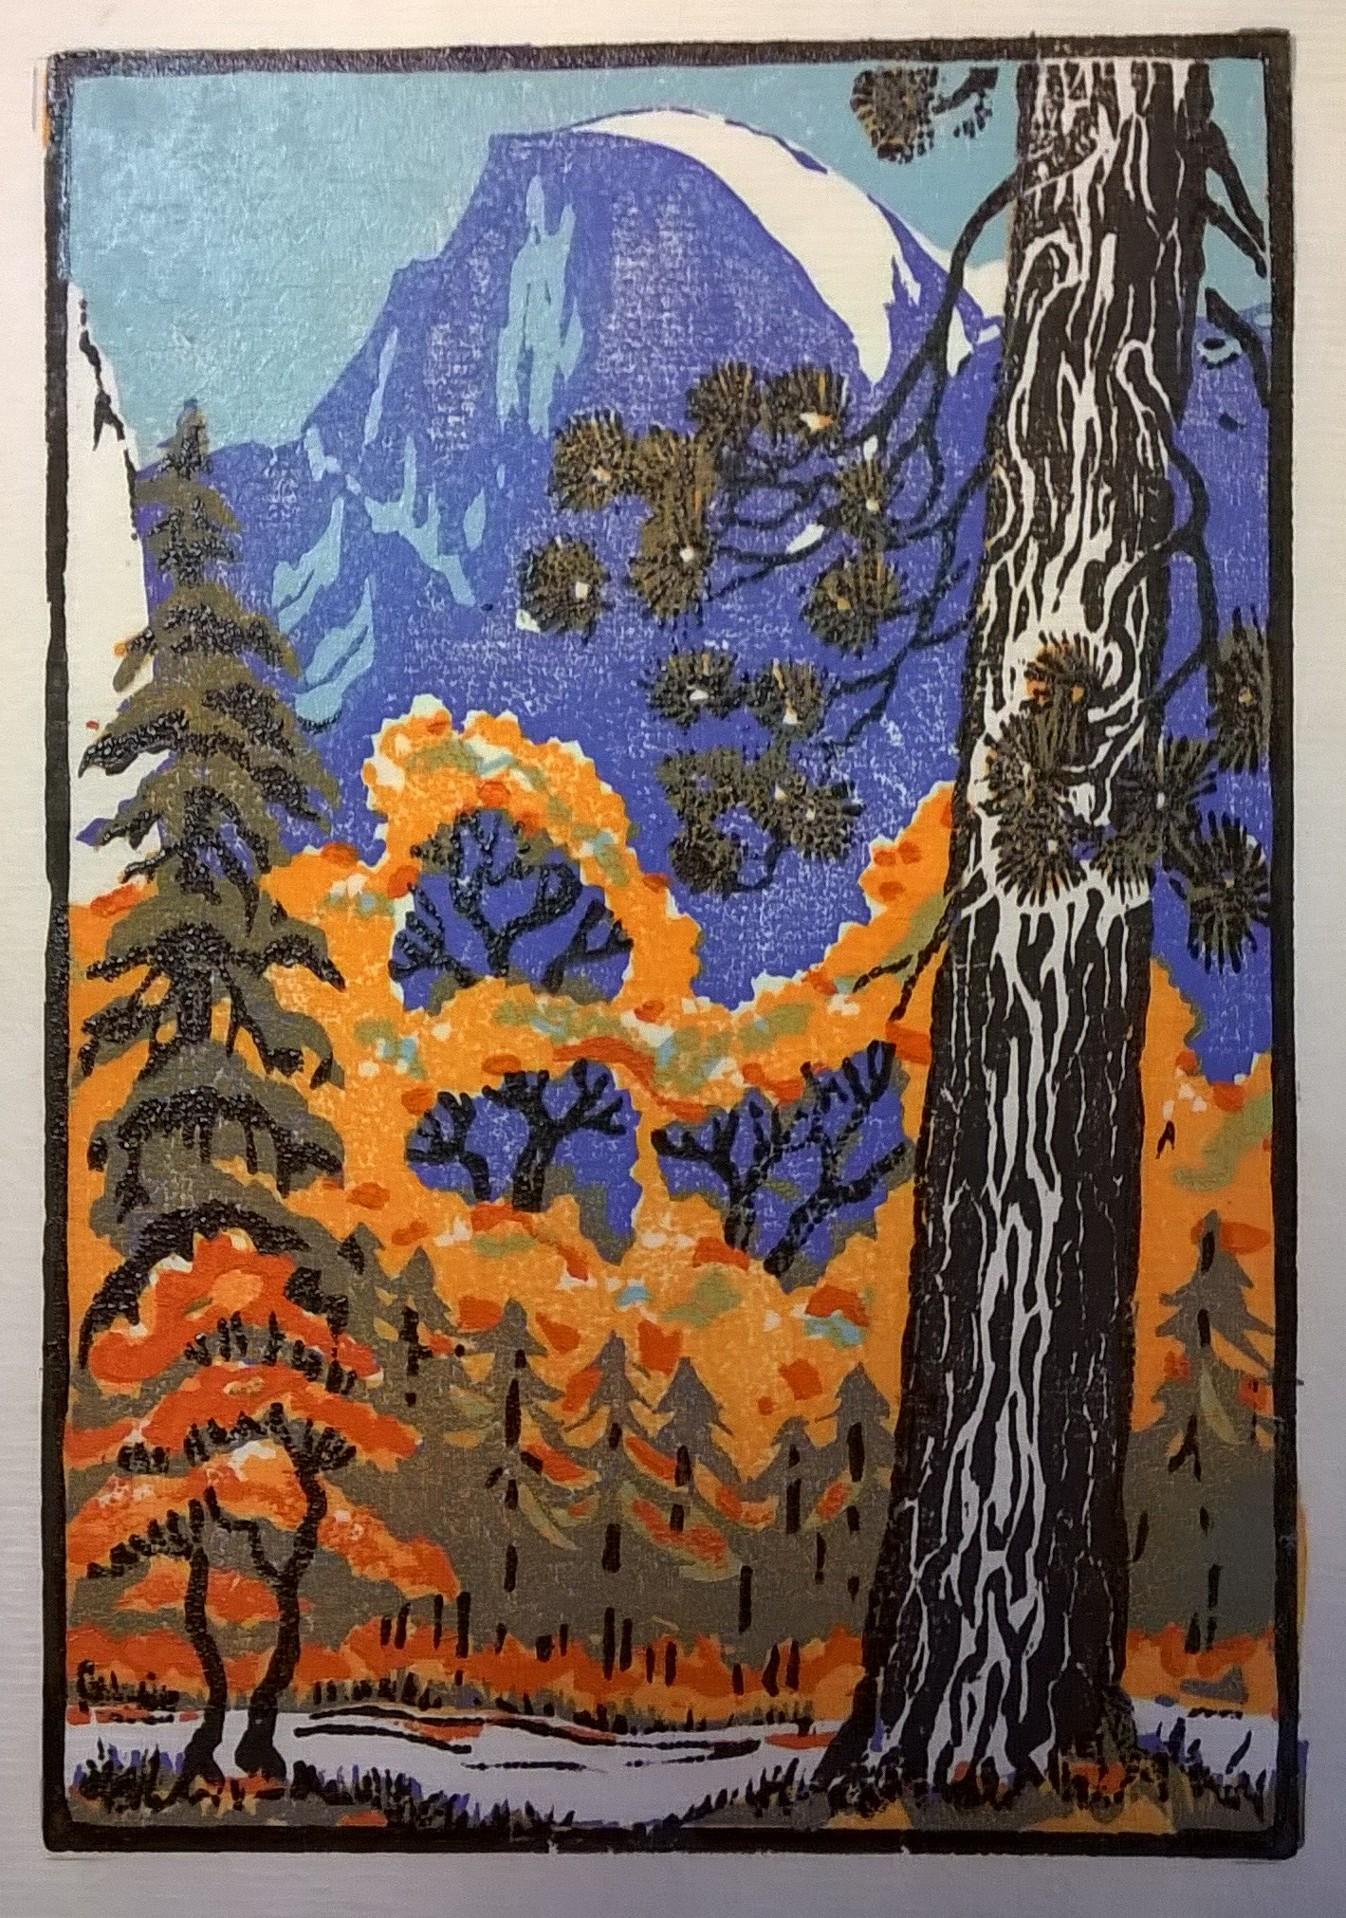 Half Dome Autumn, Yosemite | Della Taylor Hoss Woodcut | Printed by Martino Hoss | 5.25 x 7.5 in | $250